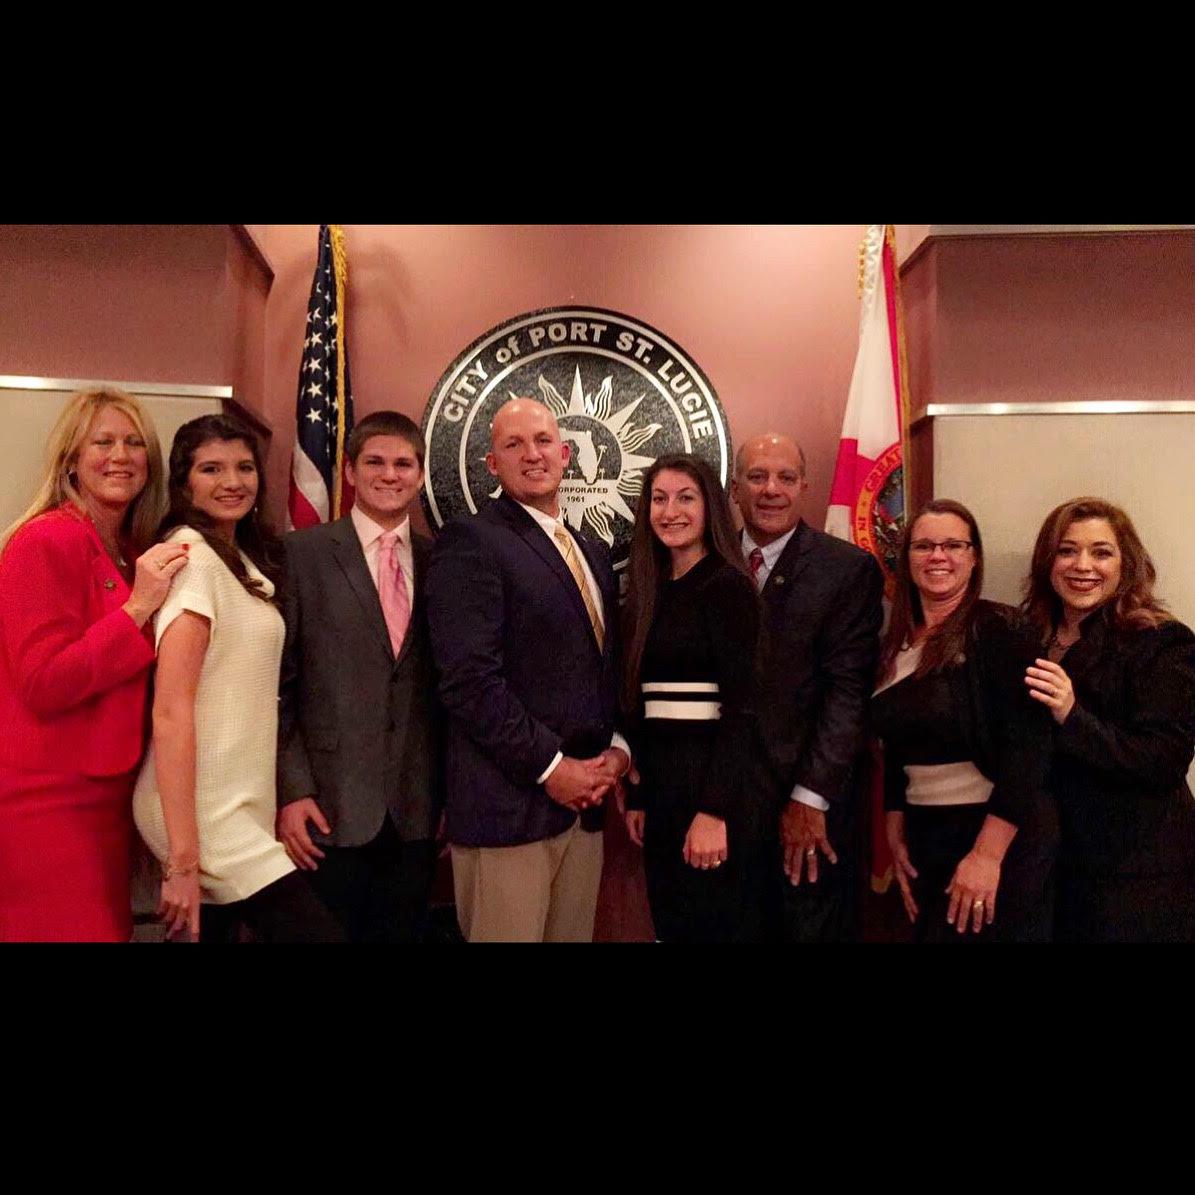 TARS with Port St Lucie City Council